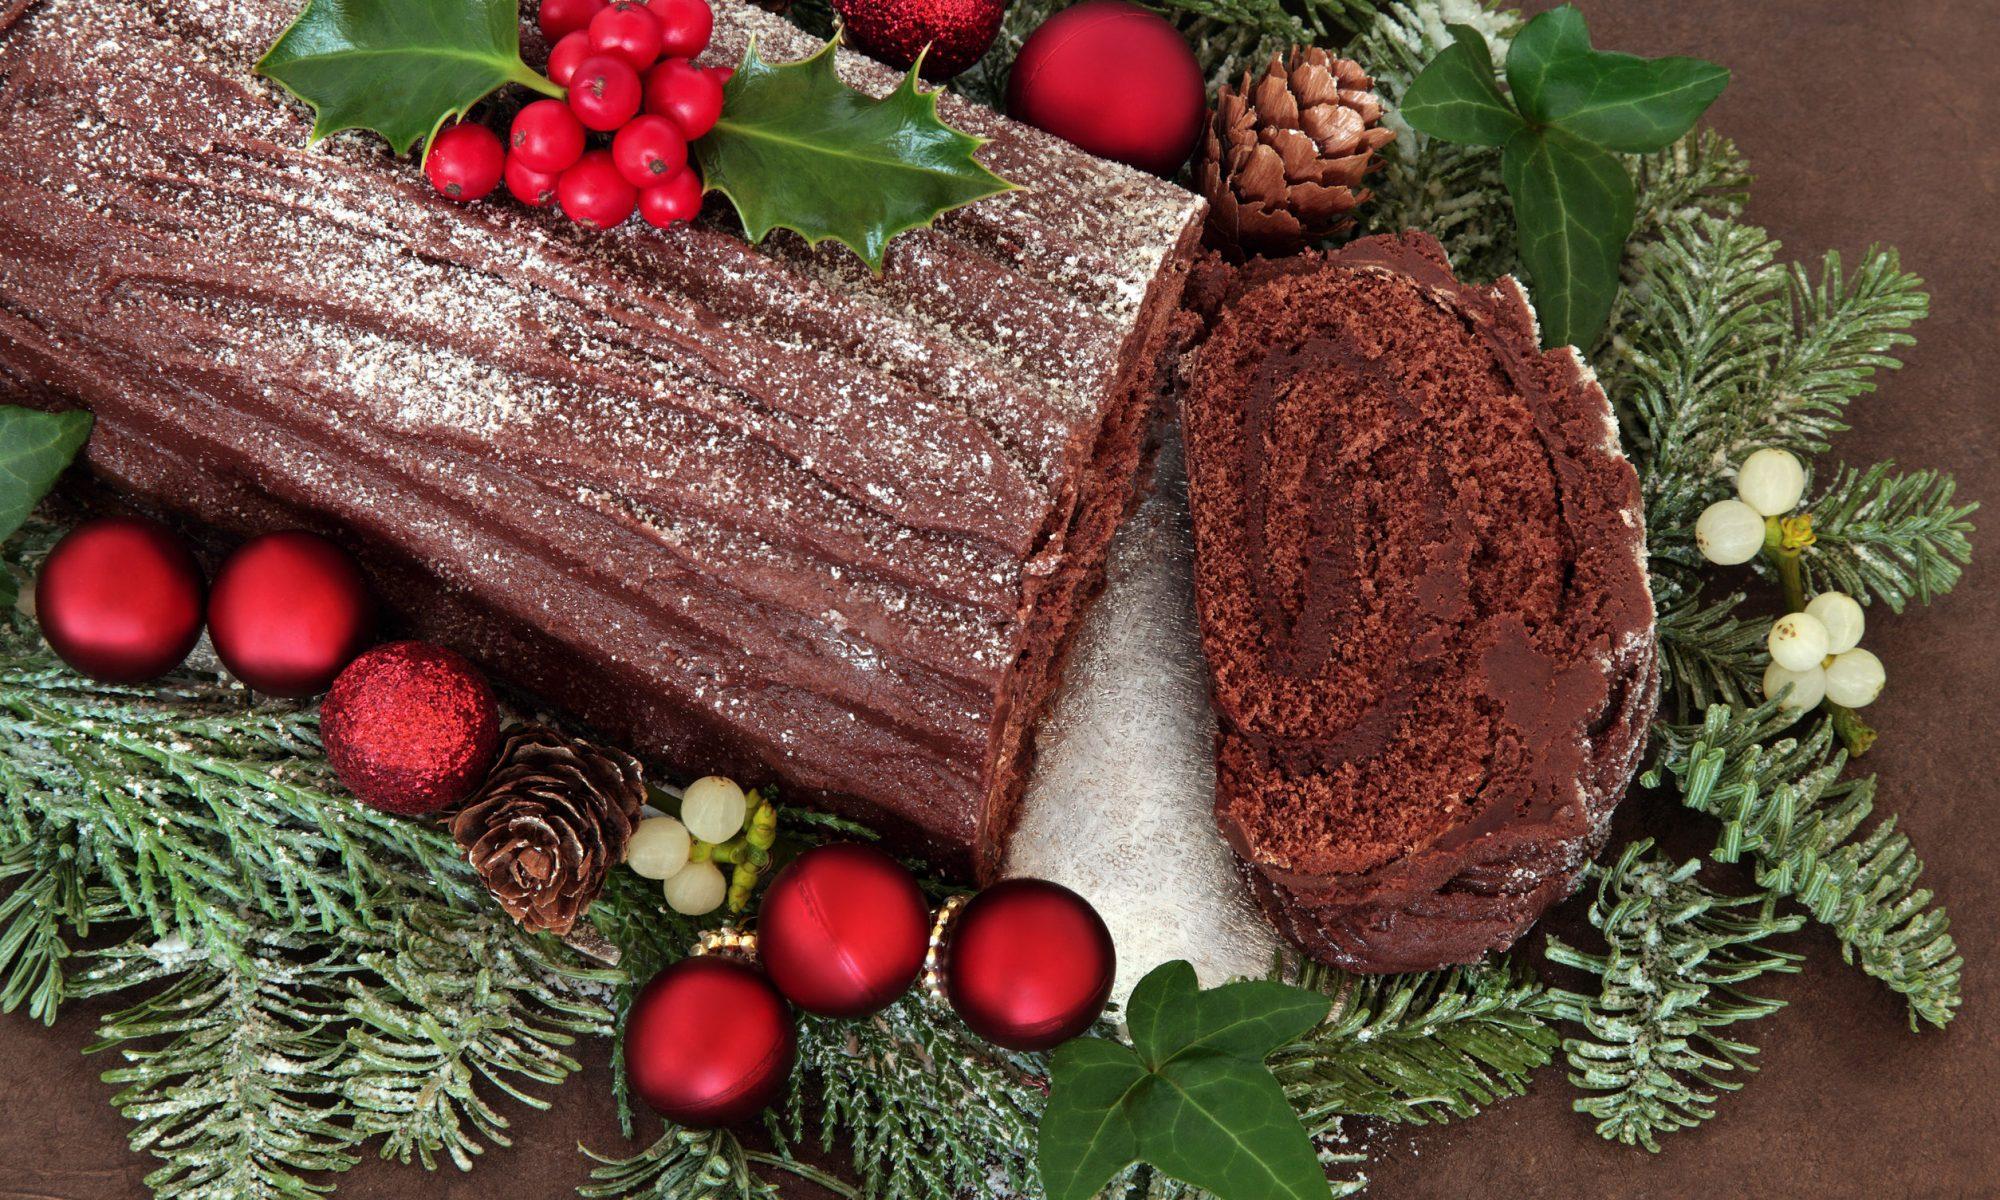 Топ 3 новогодних десерта